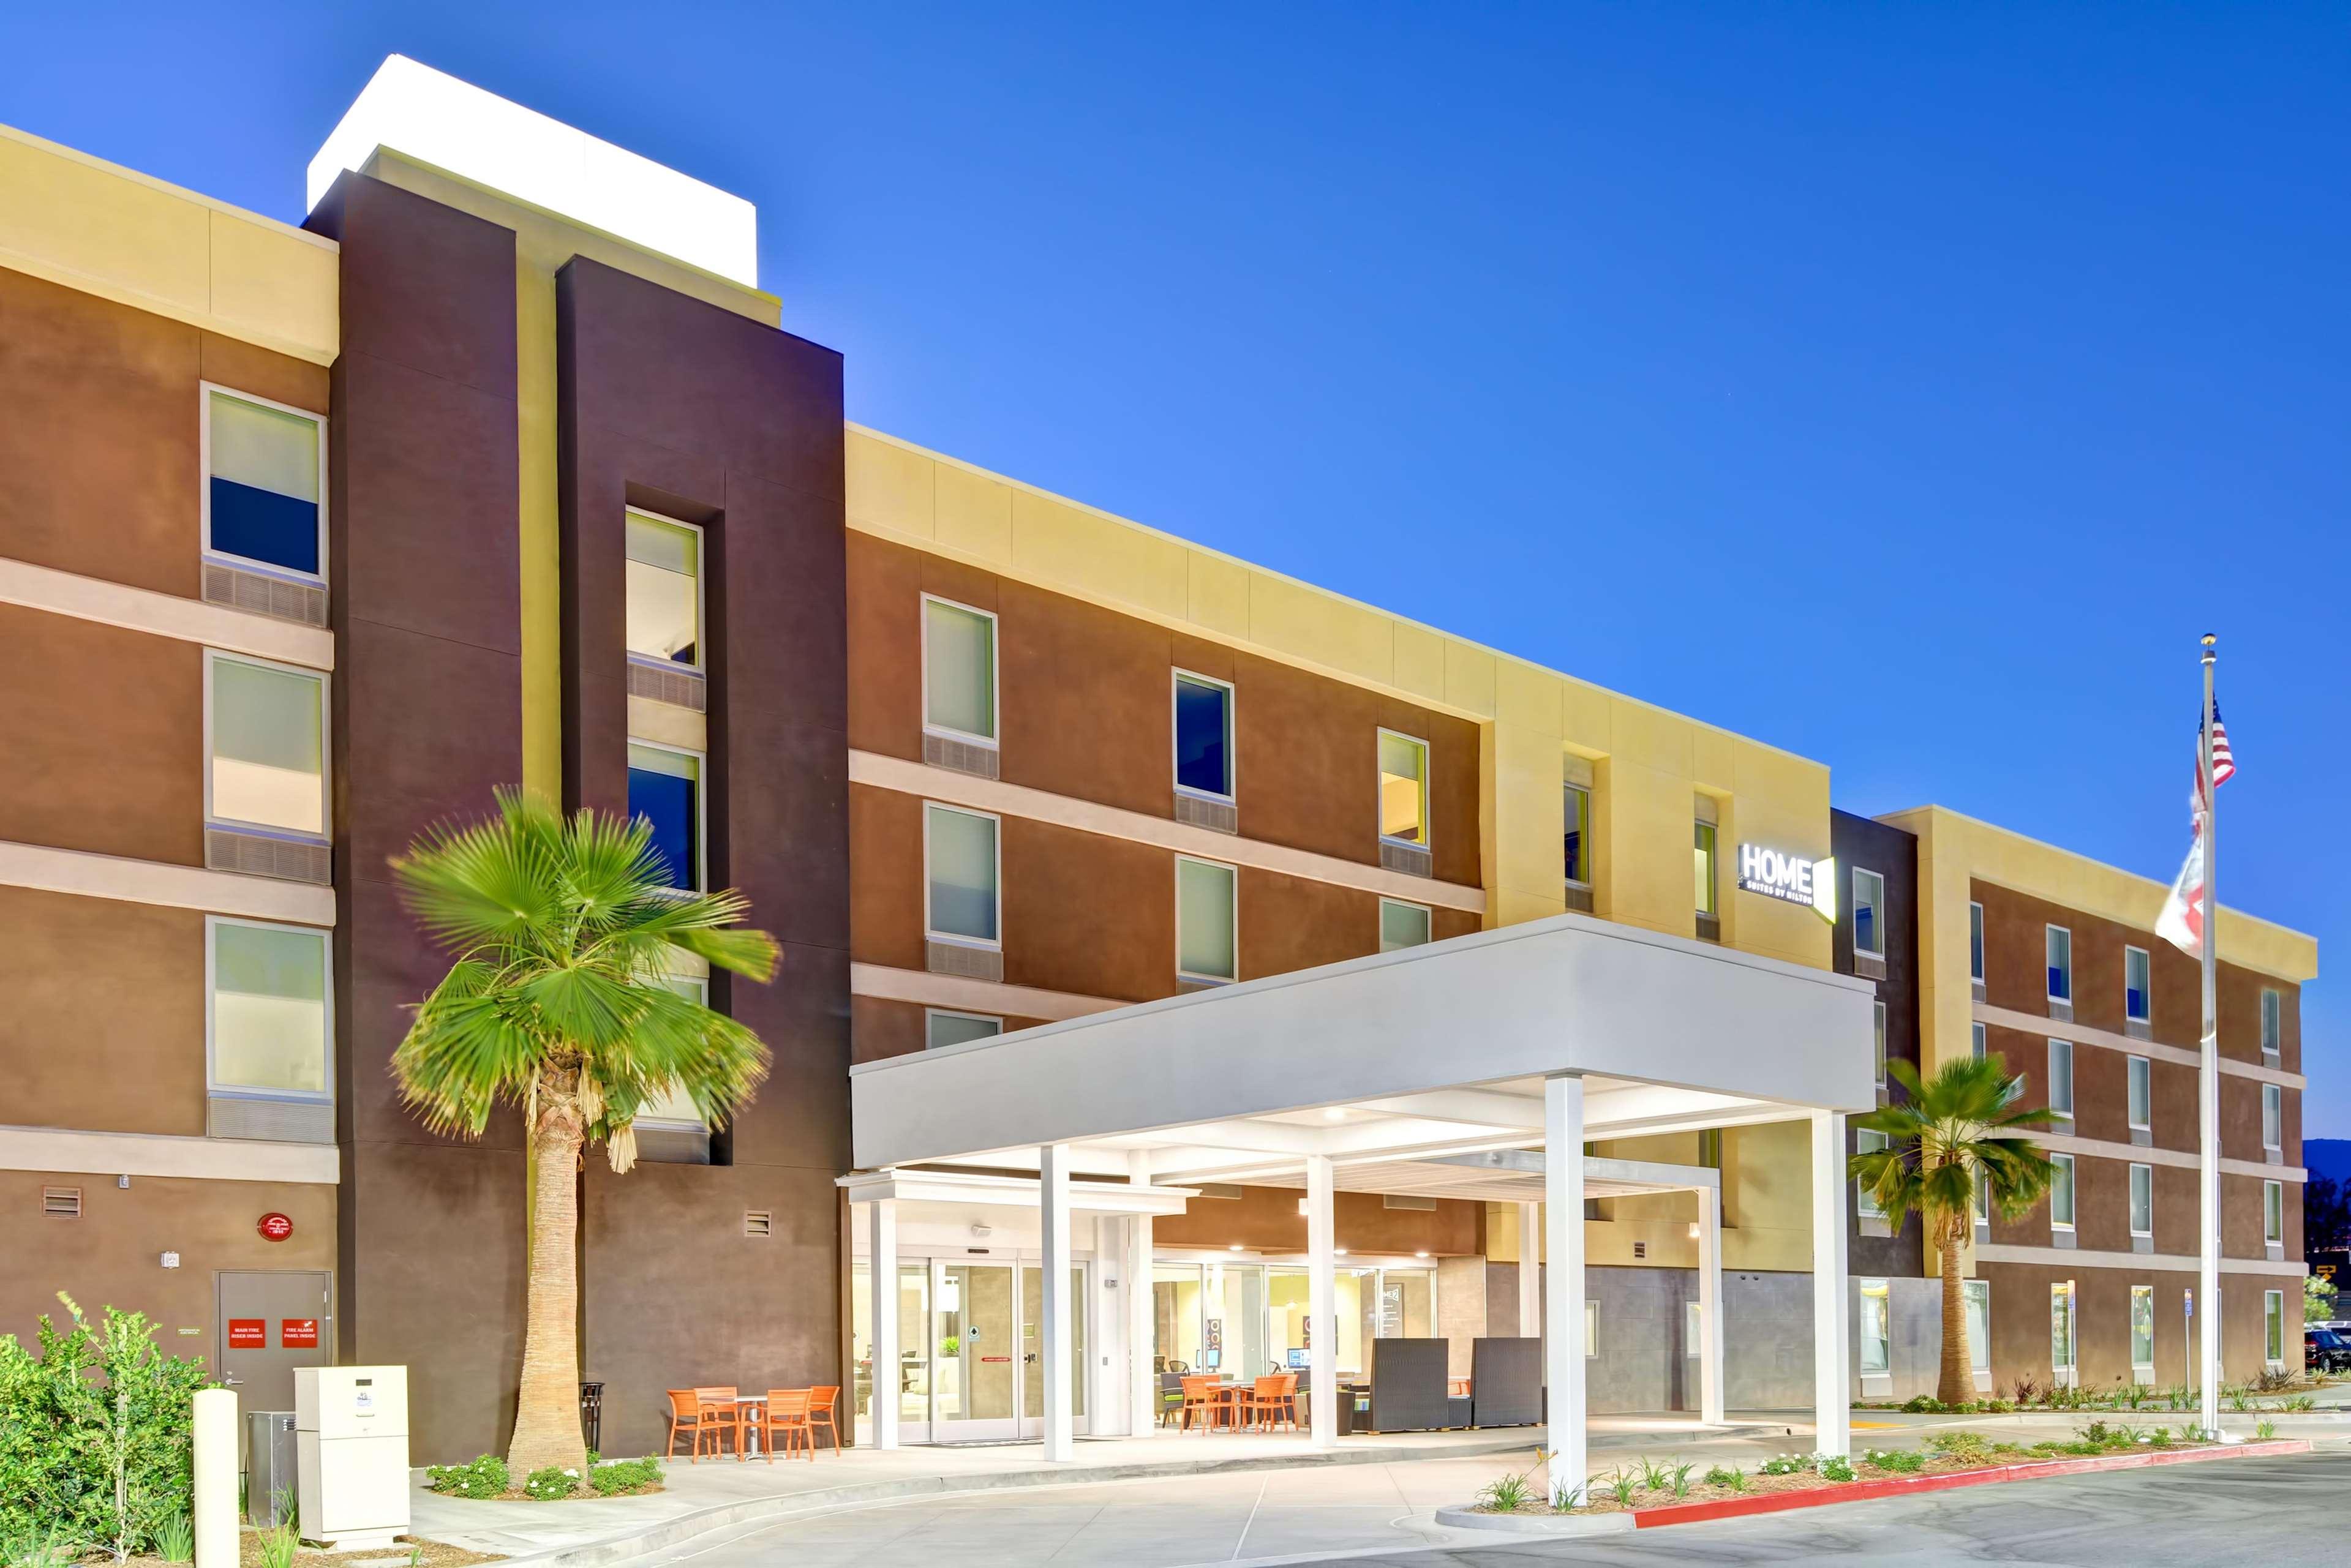 Home2 Suites by Hilton Azusa image 5